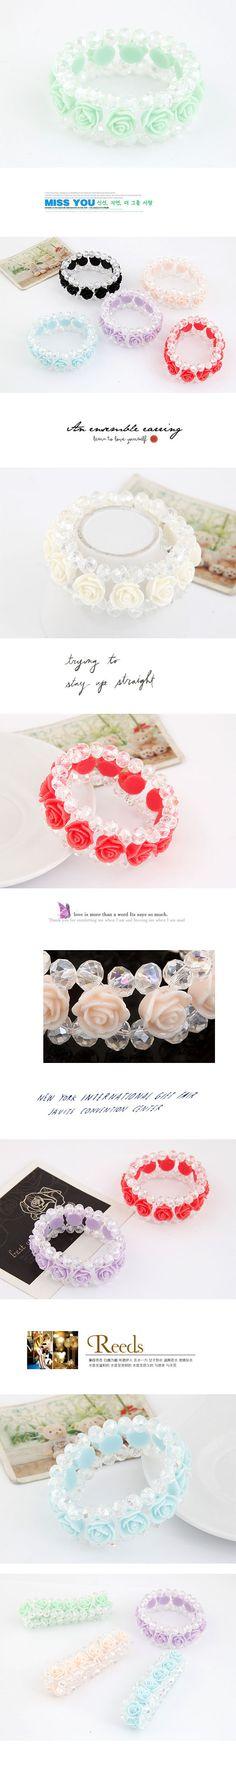 Wholesale Partido elegante fácil rosa pulsera de cristal (púrpura) | Callesetas